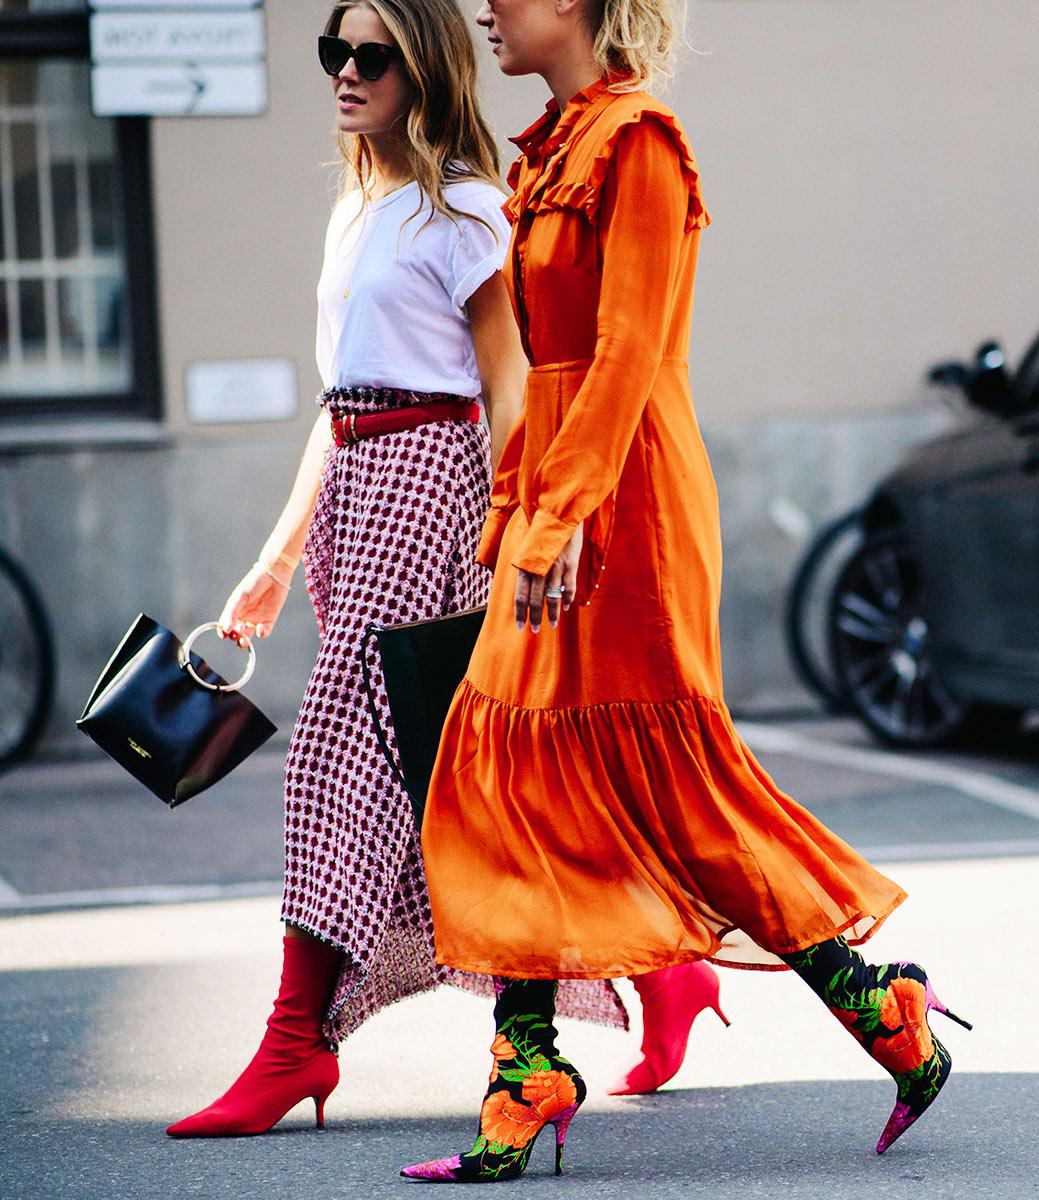 oslo-street-style-red-boots-sock-boots-asymmetrical-skirt-orange-dress-nina-sandbech-line-langmo